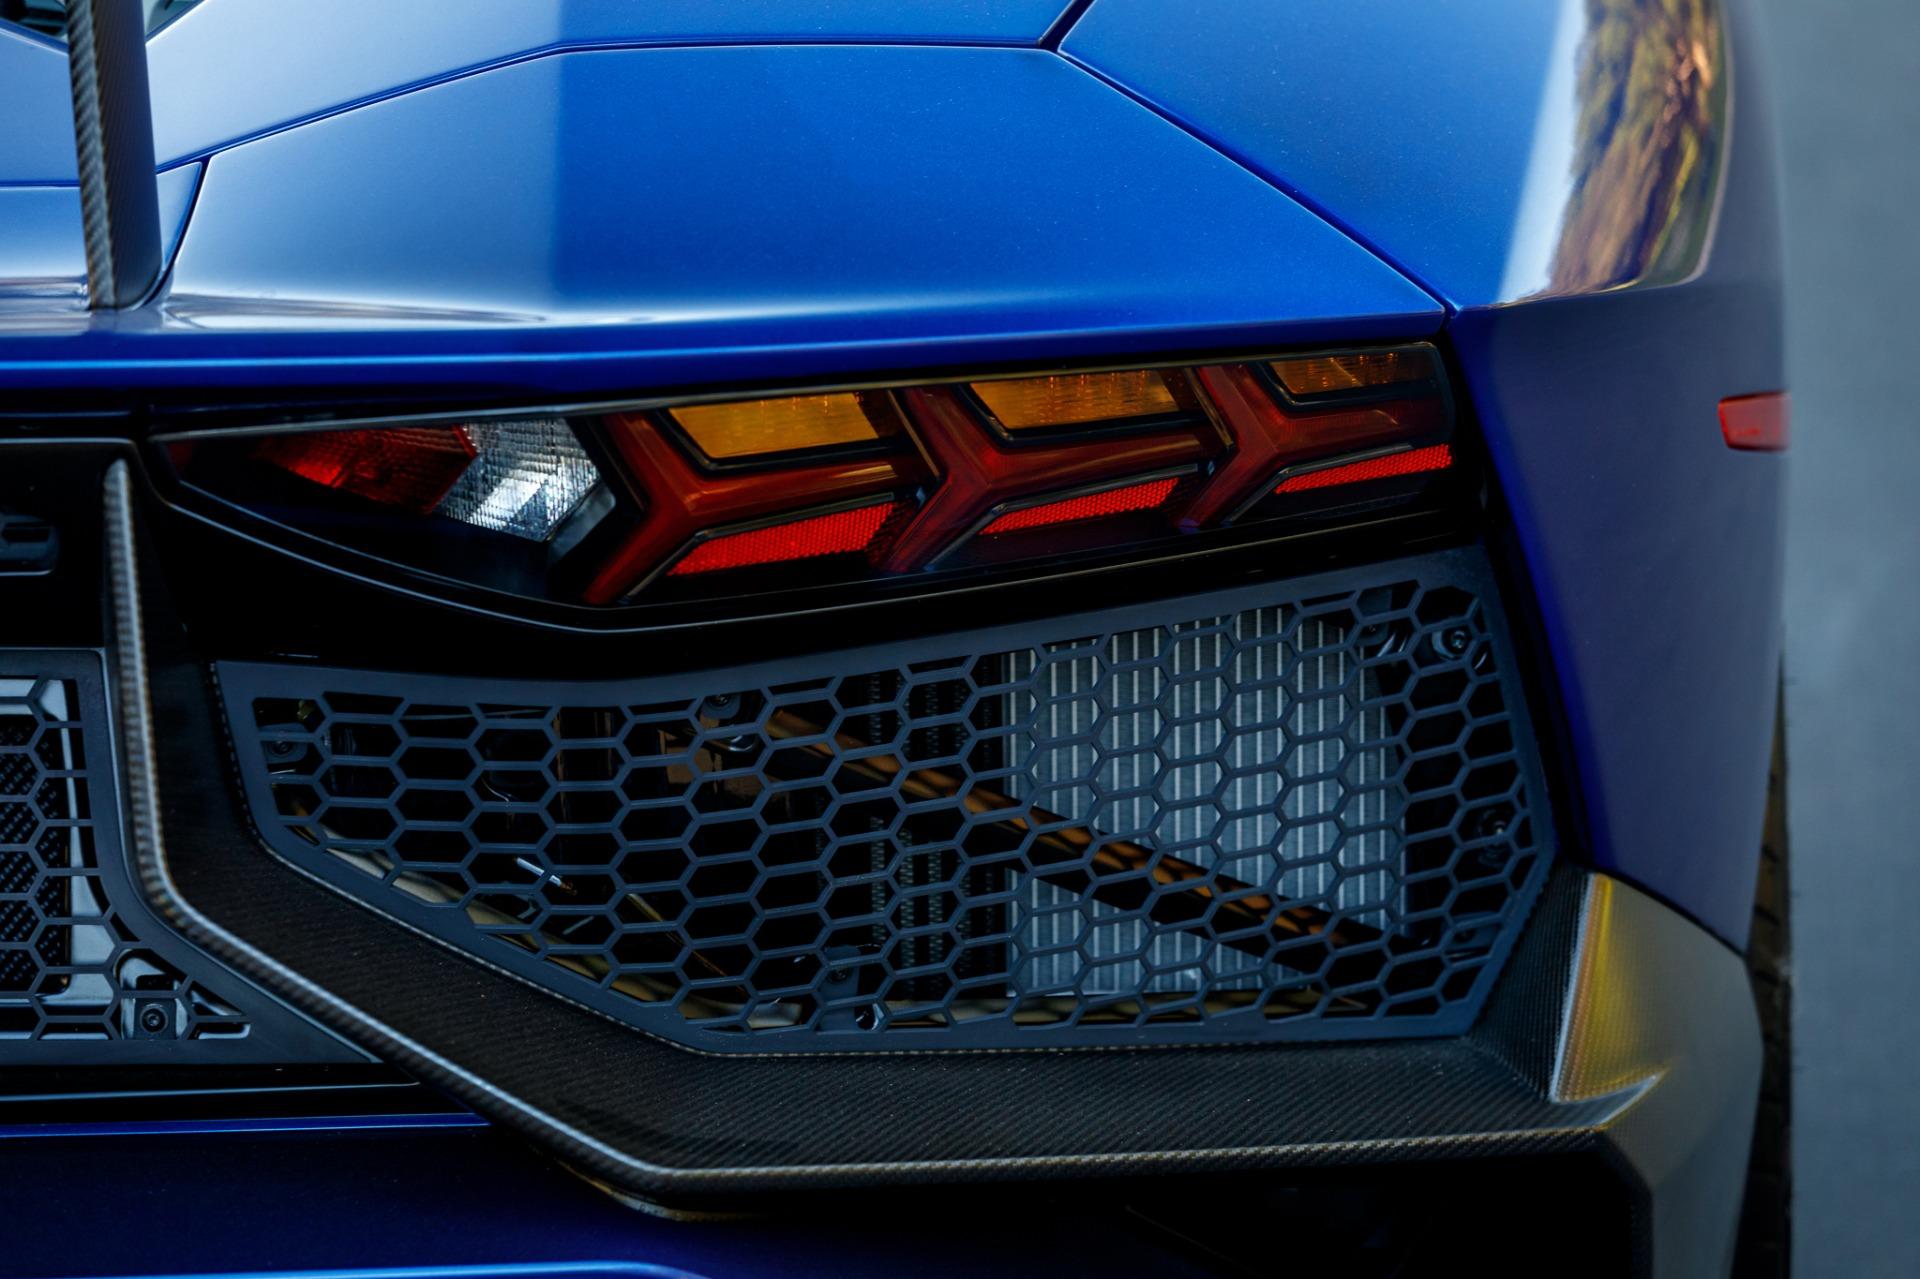 Used 2017 Lamborghini Aventador LP 750-4 SV / 740HP / AWD / 1930 MI / NAV / CAMERA for sale Sold at Formula Imports in Charlotte NC 28227 31